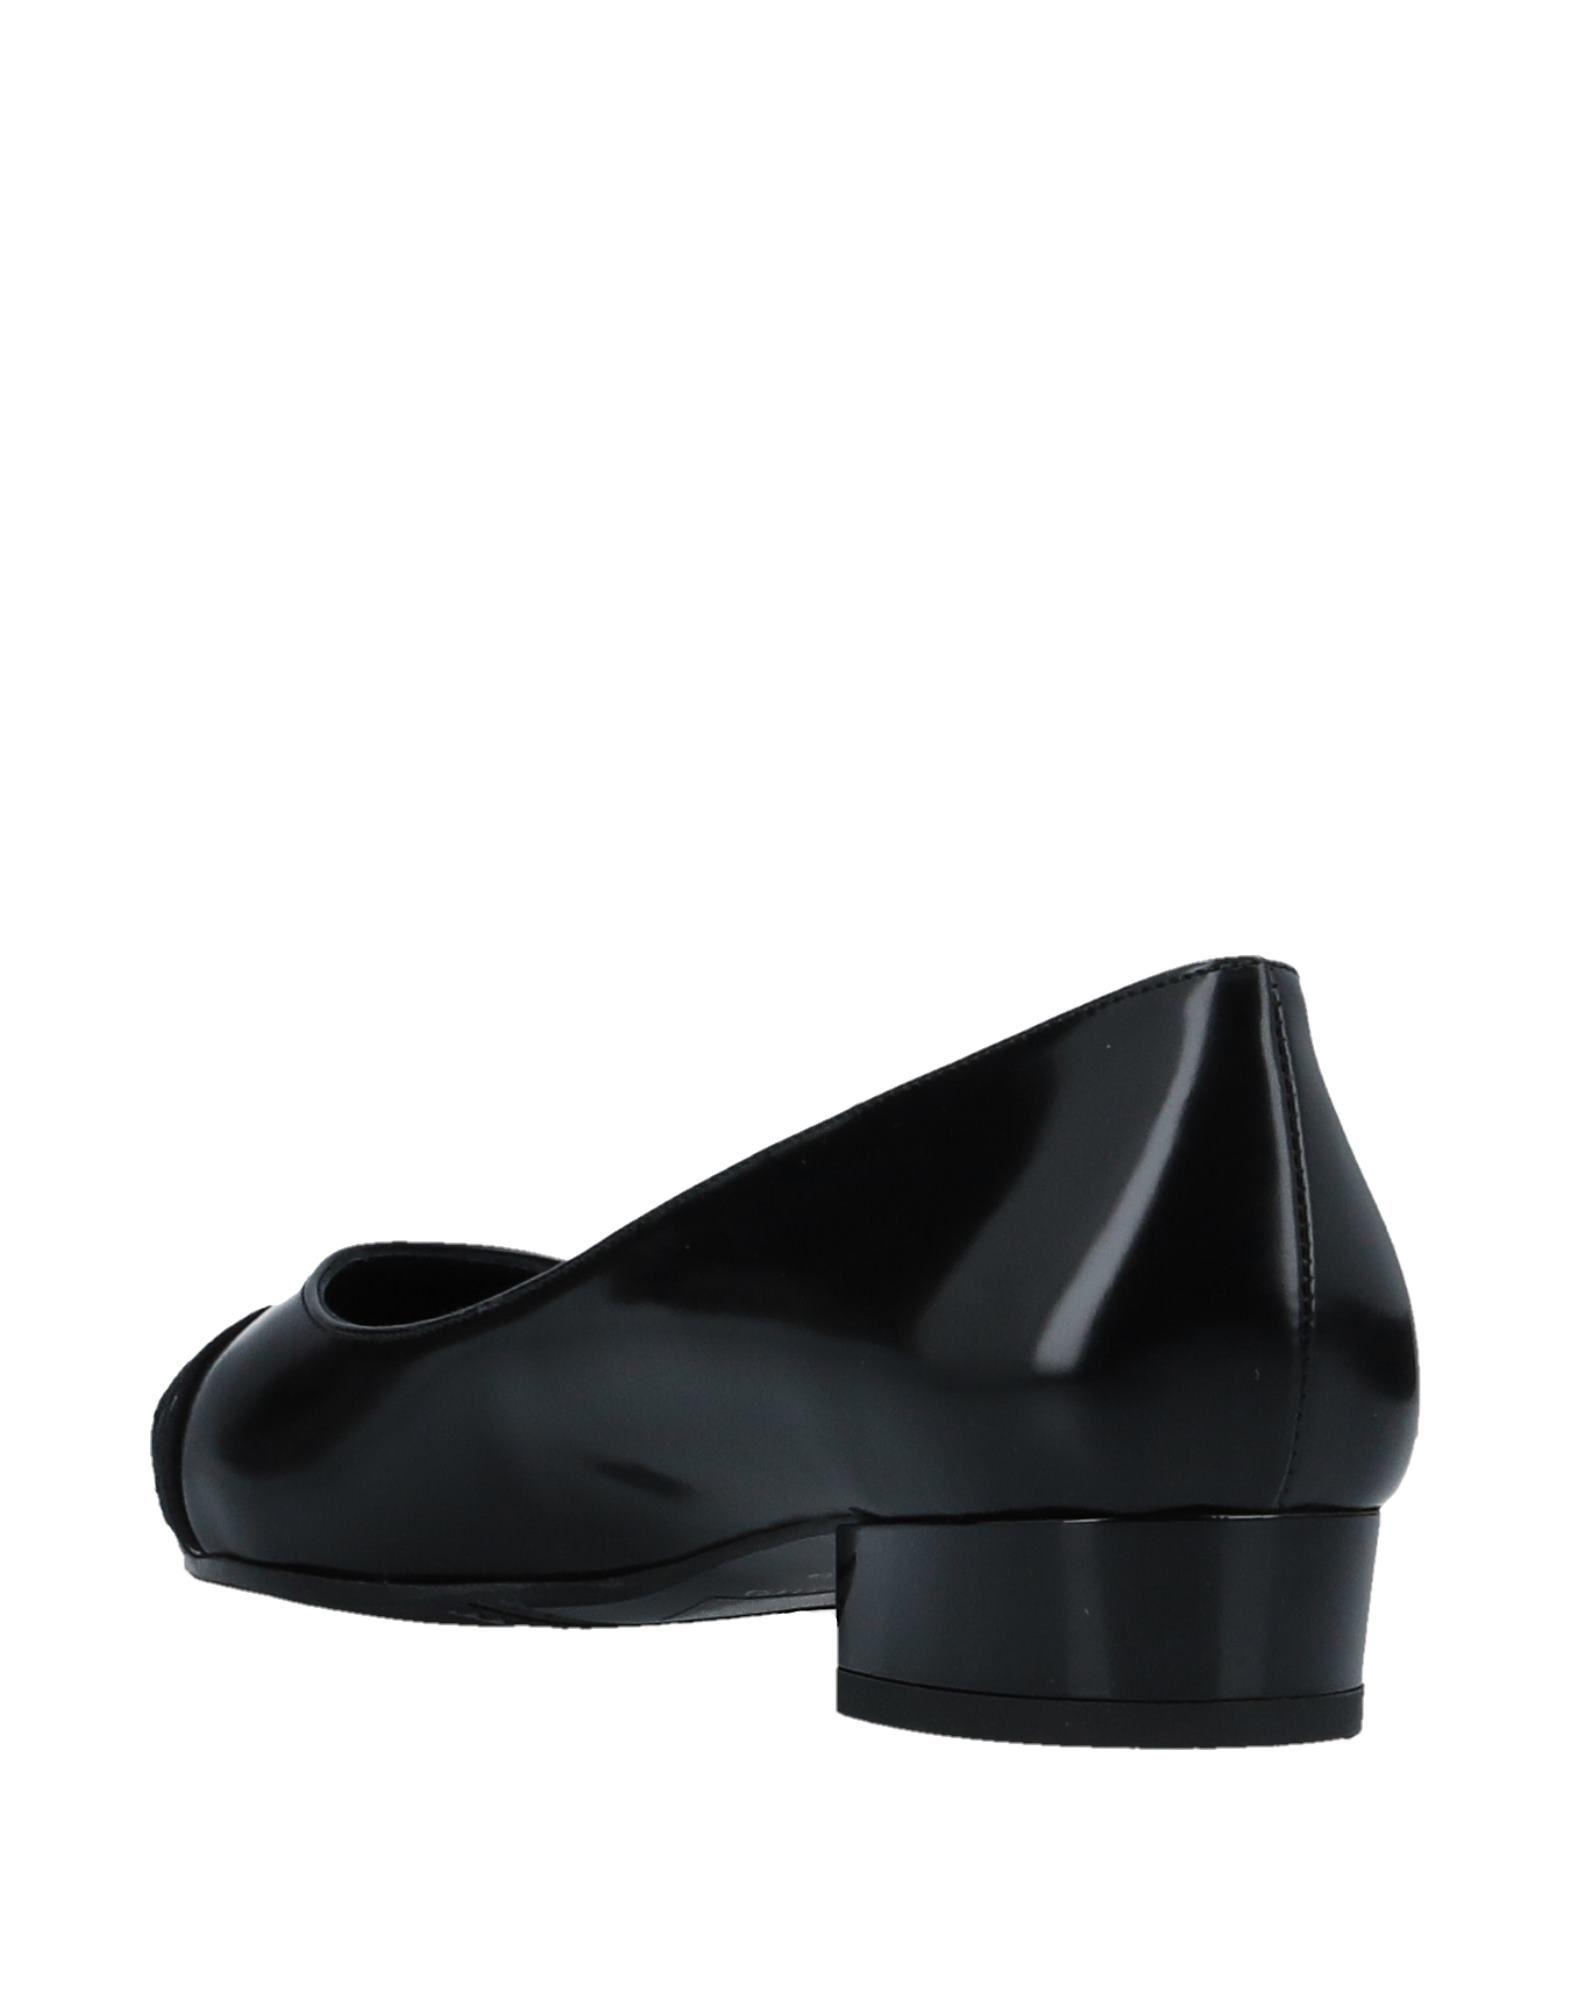 Stilvolle billige Schuhe Schuhe billige Fiorangelo Pumps Damen  11511464KM f52727